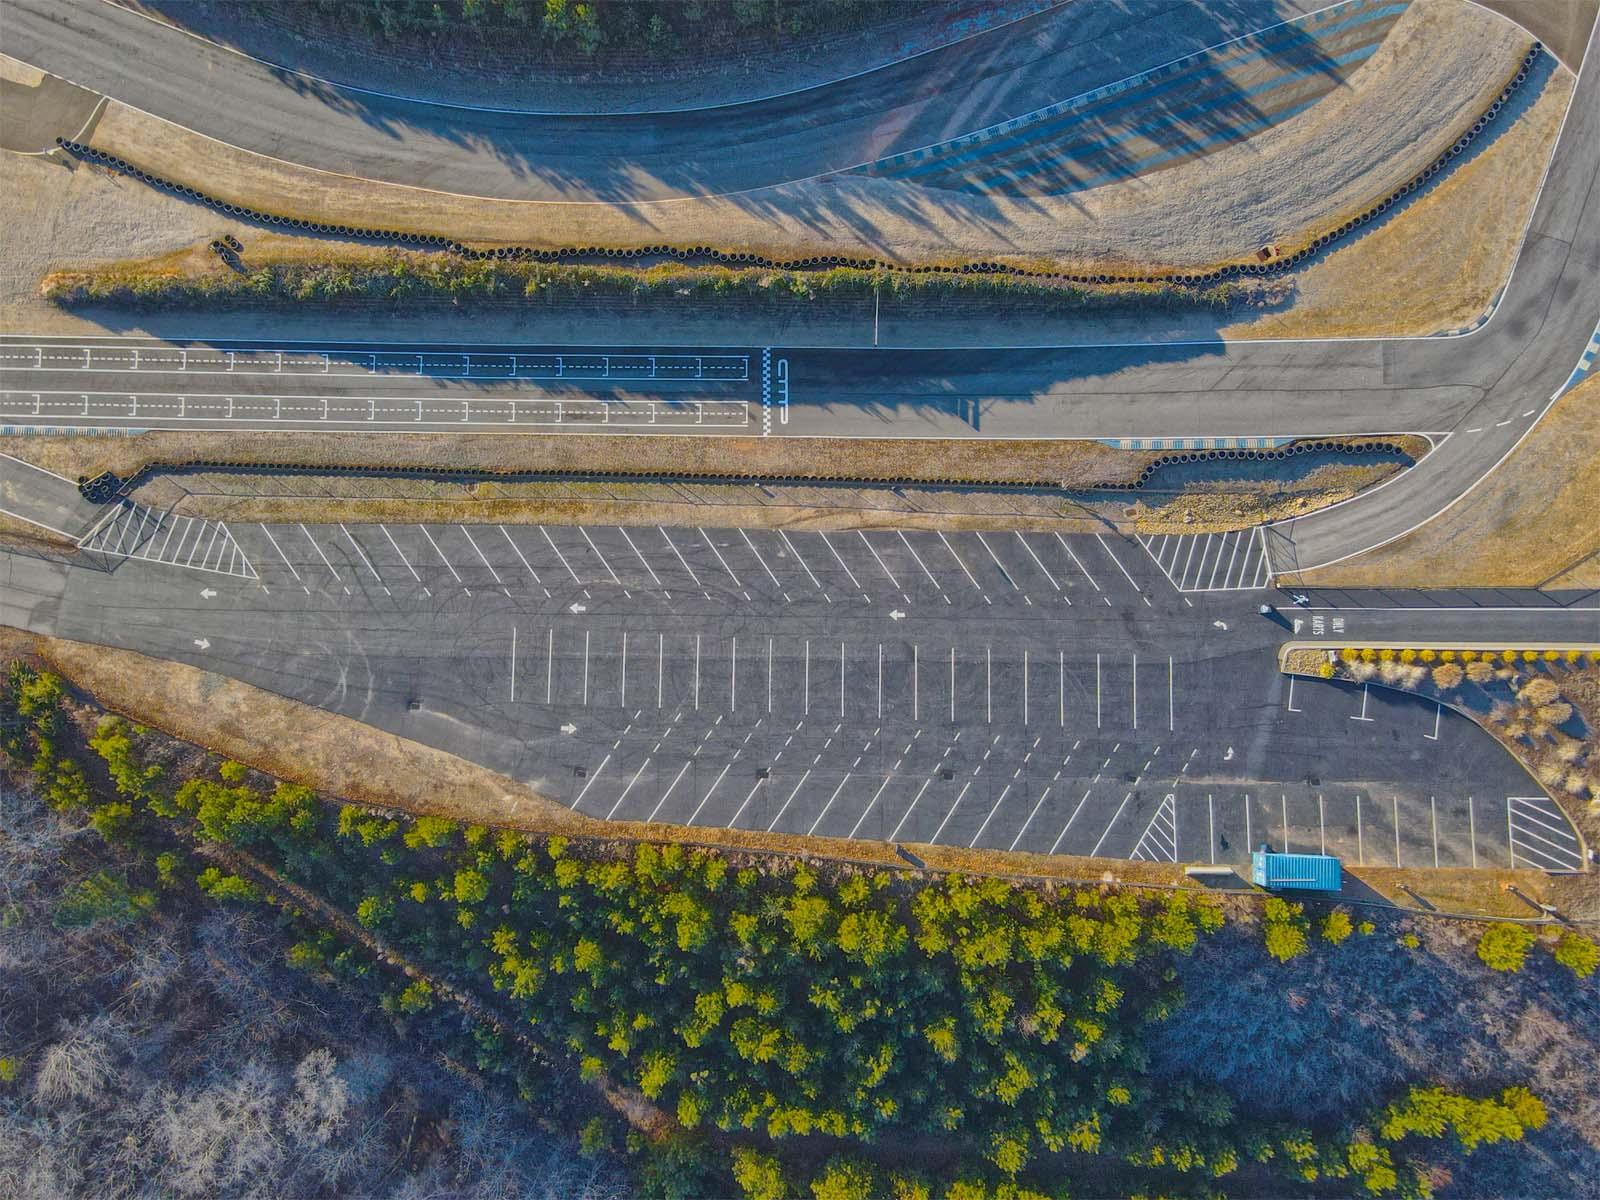 KT parking lot web - 2020 Improvements at AMP (Review)